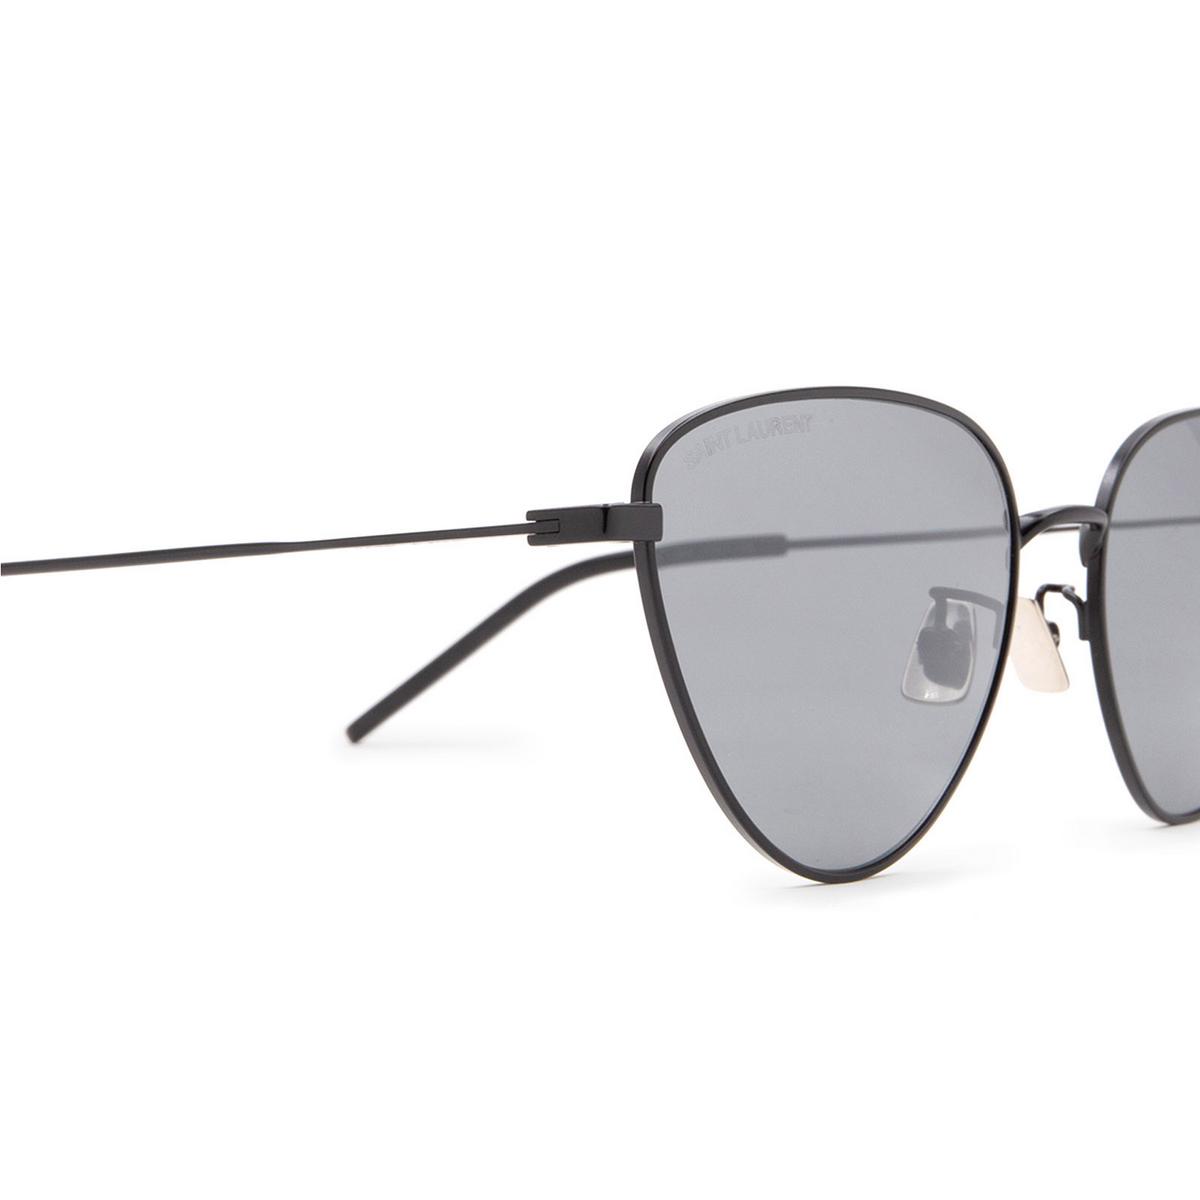 Saint Laurent® Irregular Sunglasses: SL 310 color Black 005 - 3/3.